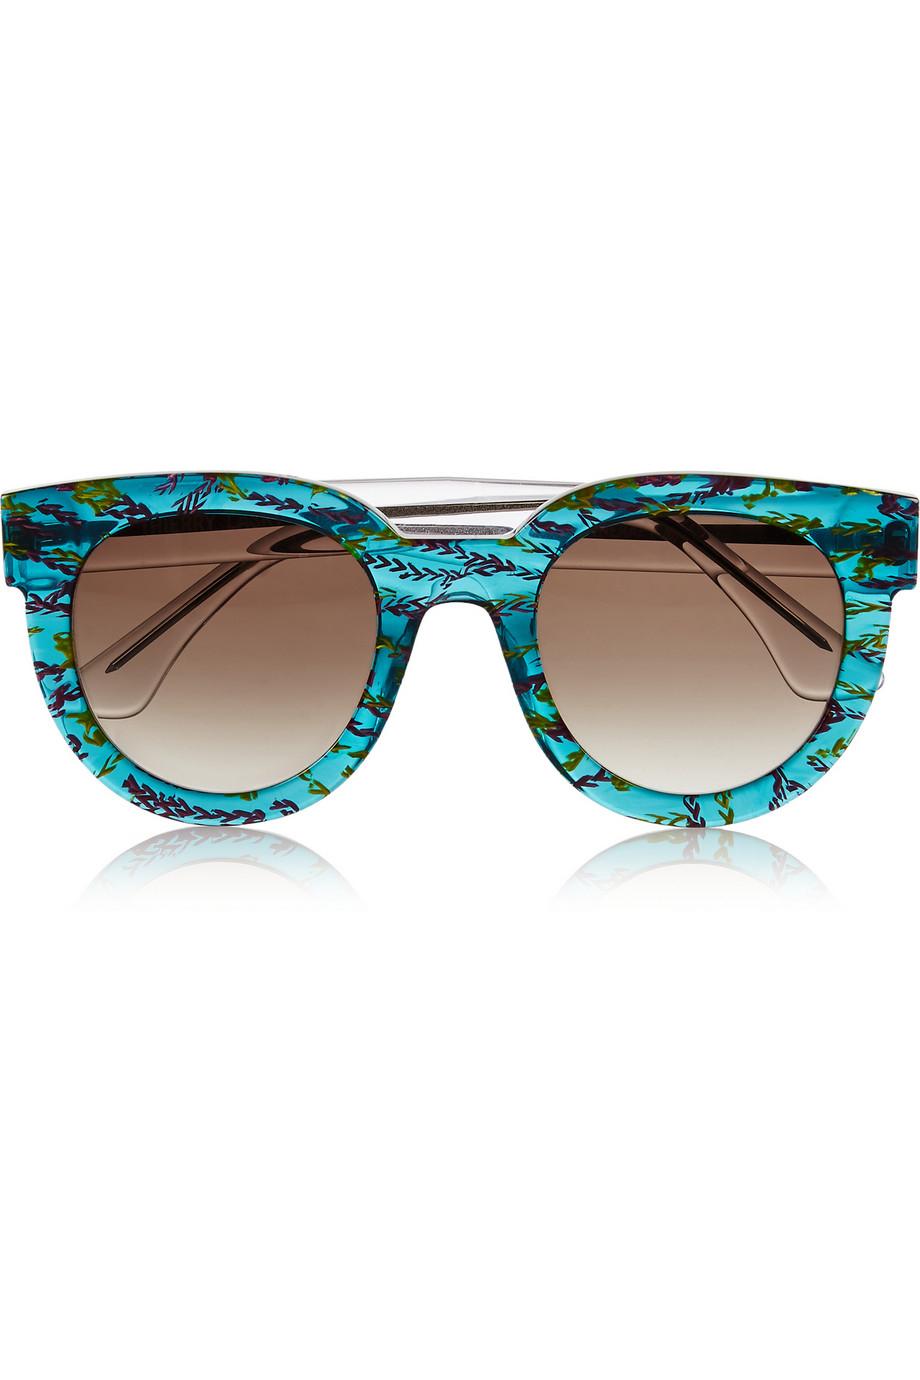 ray ban 2117  ban round glamour sunglasses